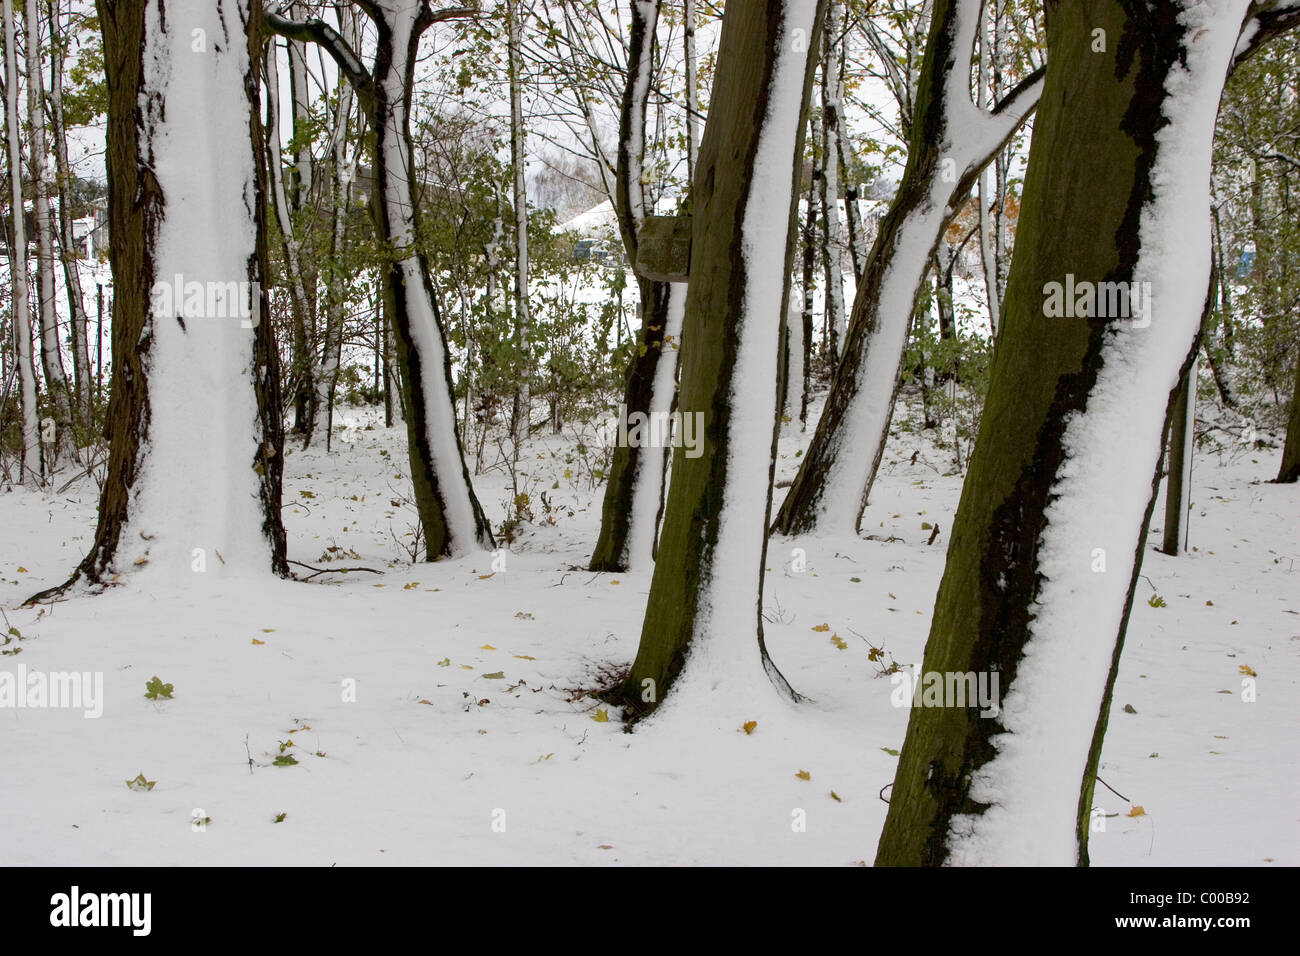 Baeume nach Schneetreiben, Trees after blowing snow Stock Photo